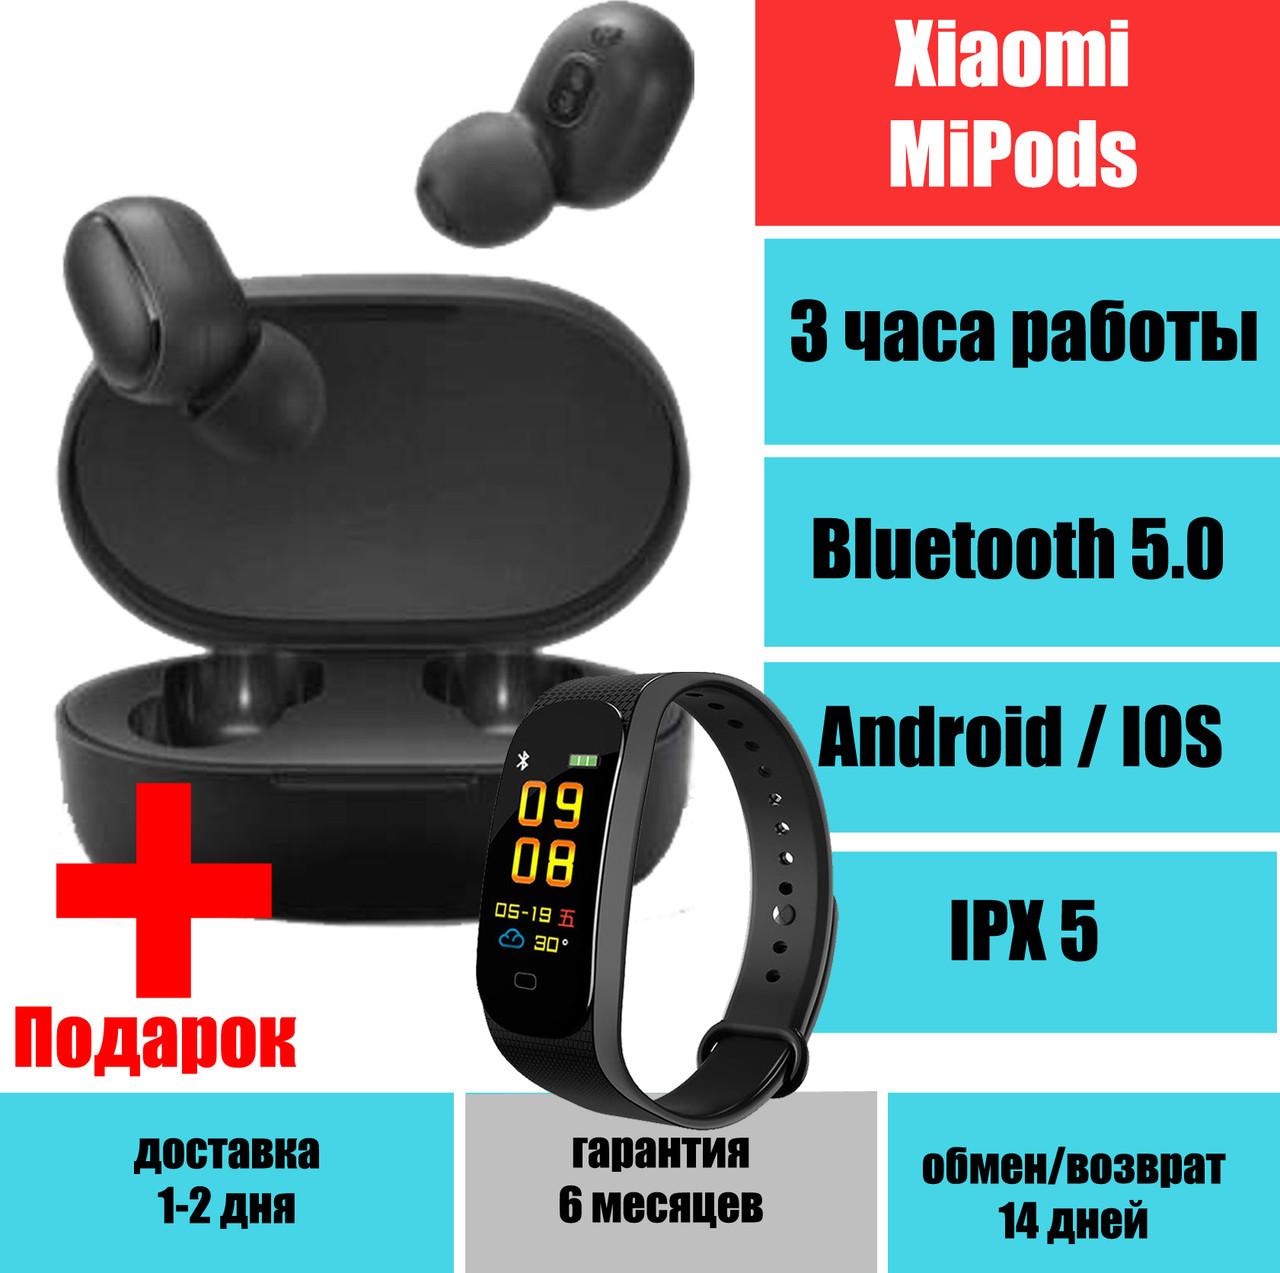 Наушники Xiaomi Redmi MiPods A6s TWS Блютуз Стерео Гарнитура QualitiReplica + Подарок M5 band